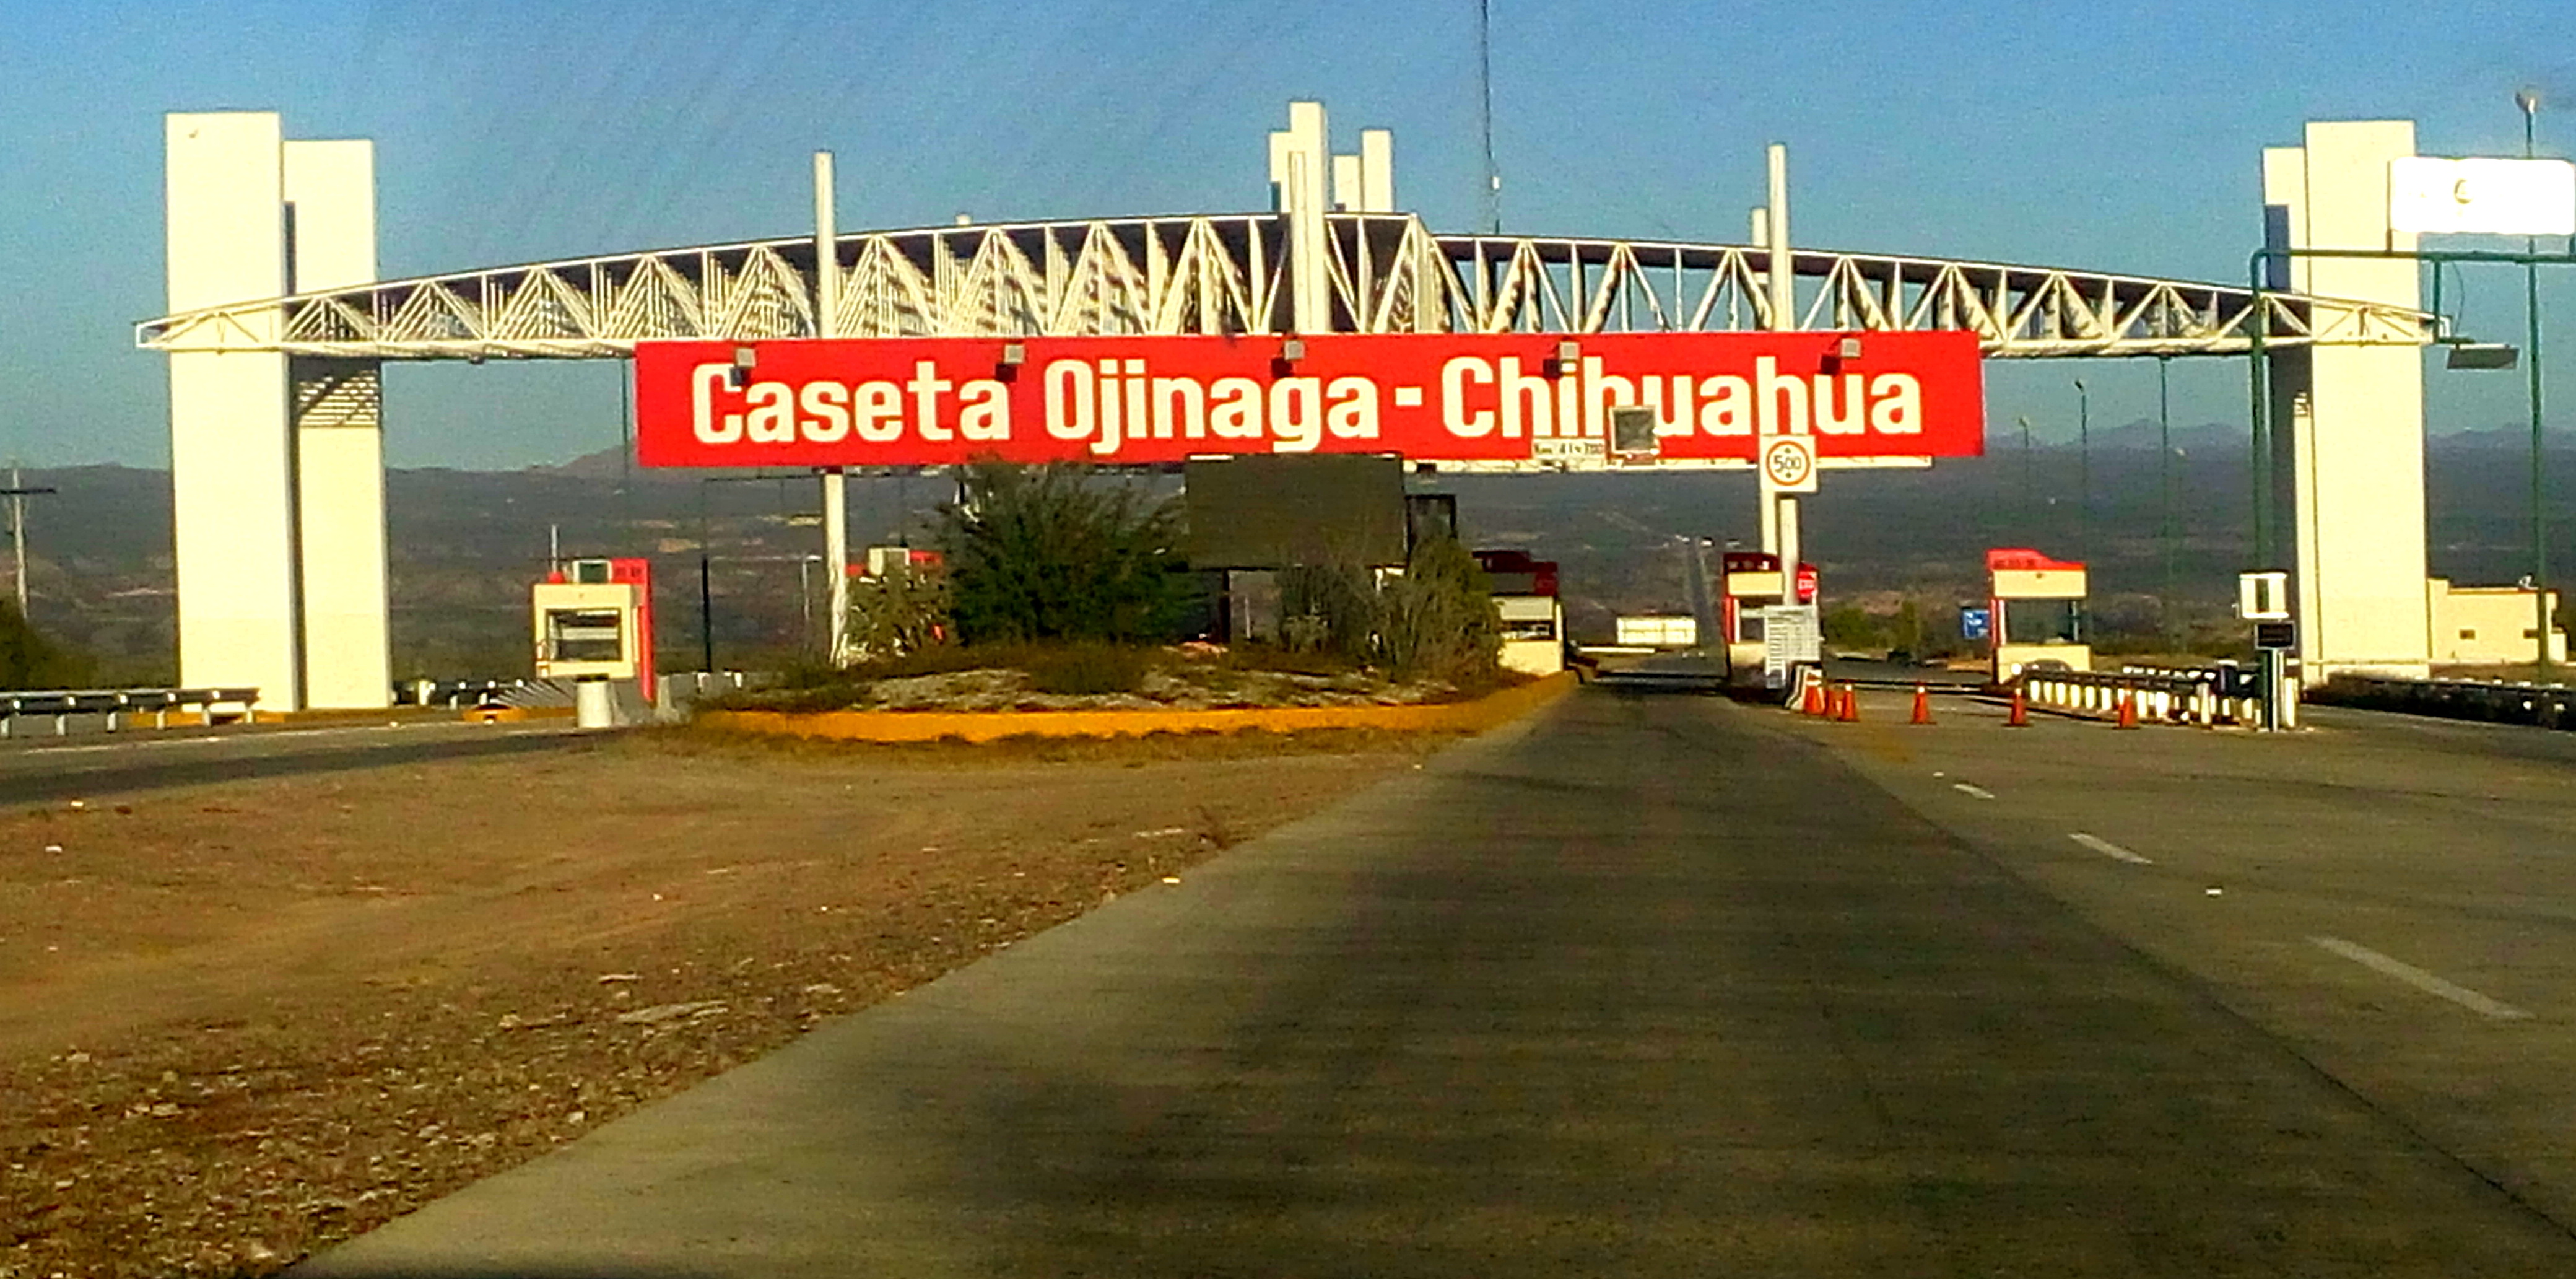 Resultado de imagen para ojinaga chihuahua